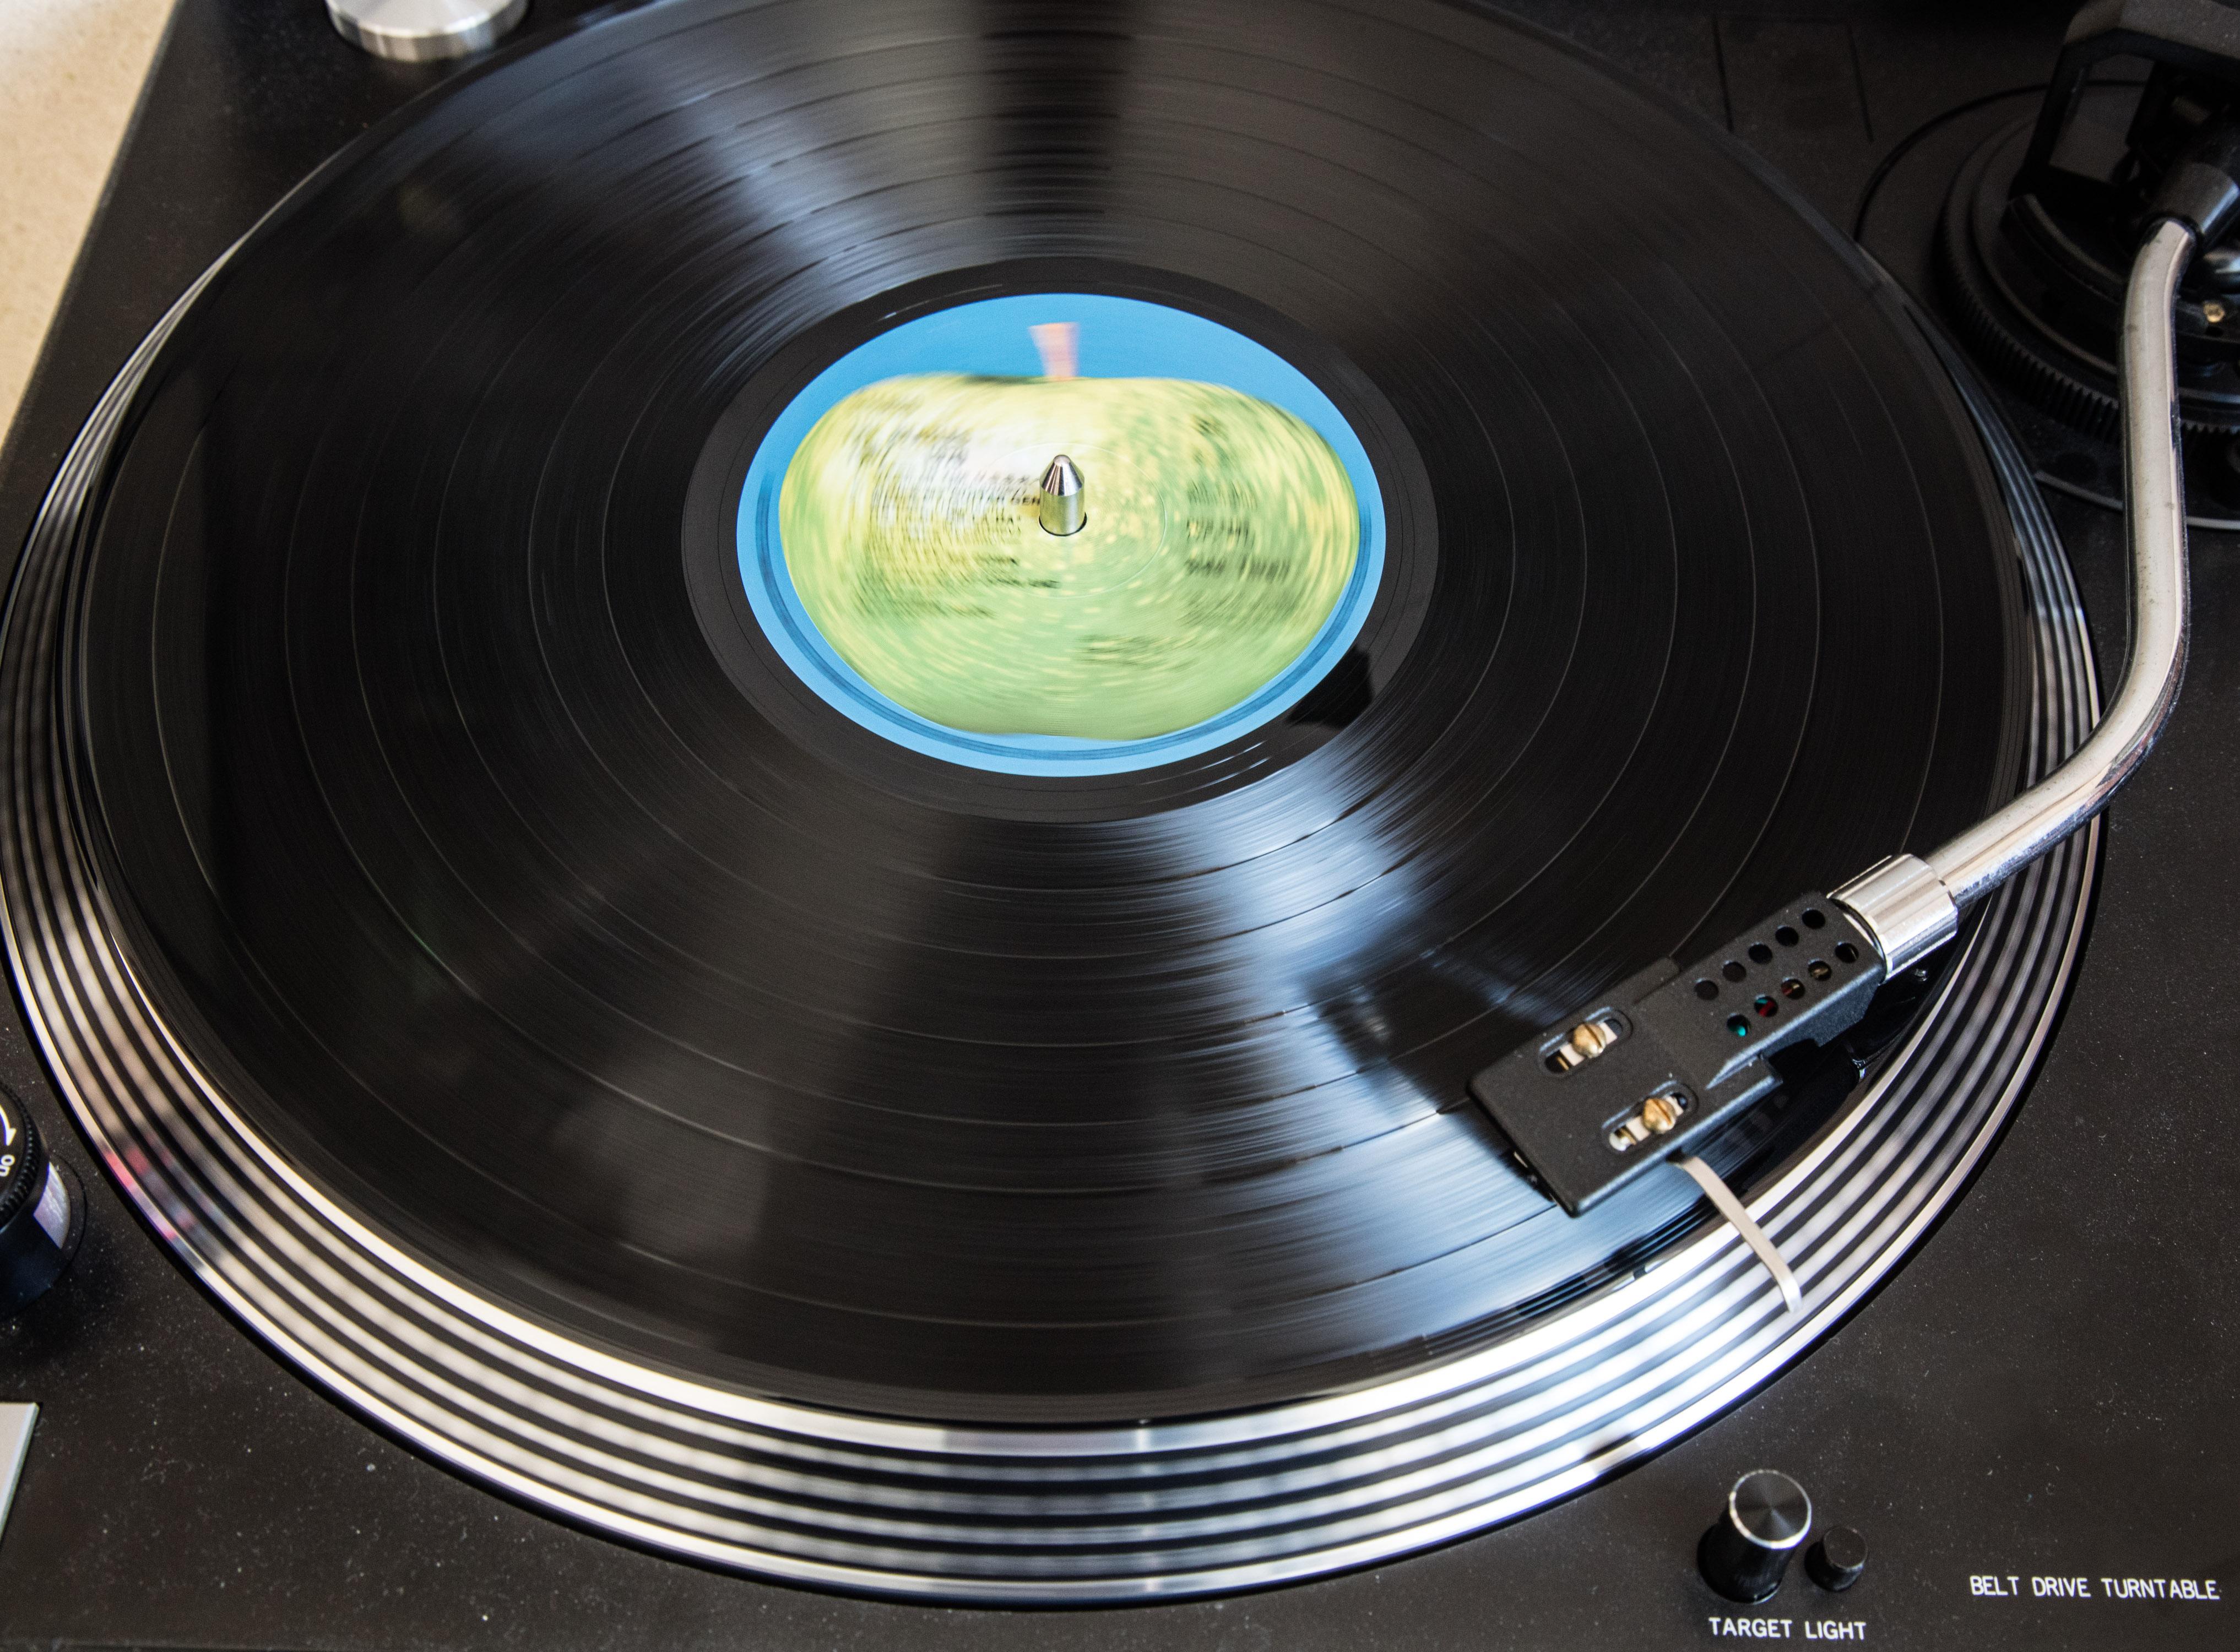 British Record Shops See A Vinyl Revival